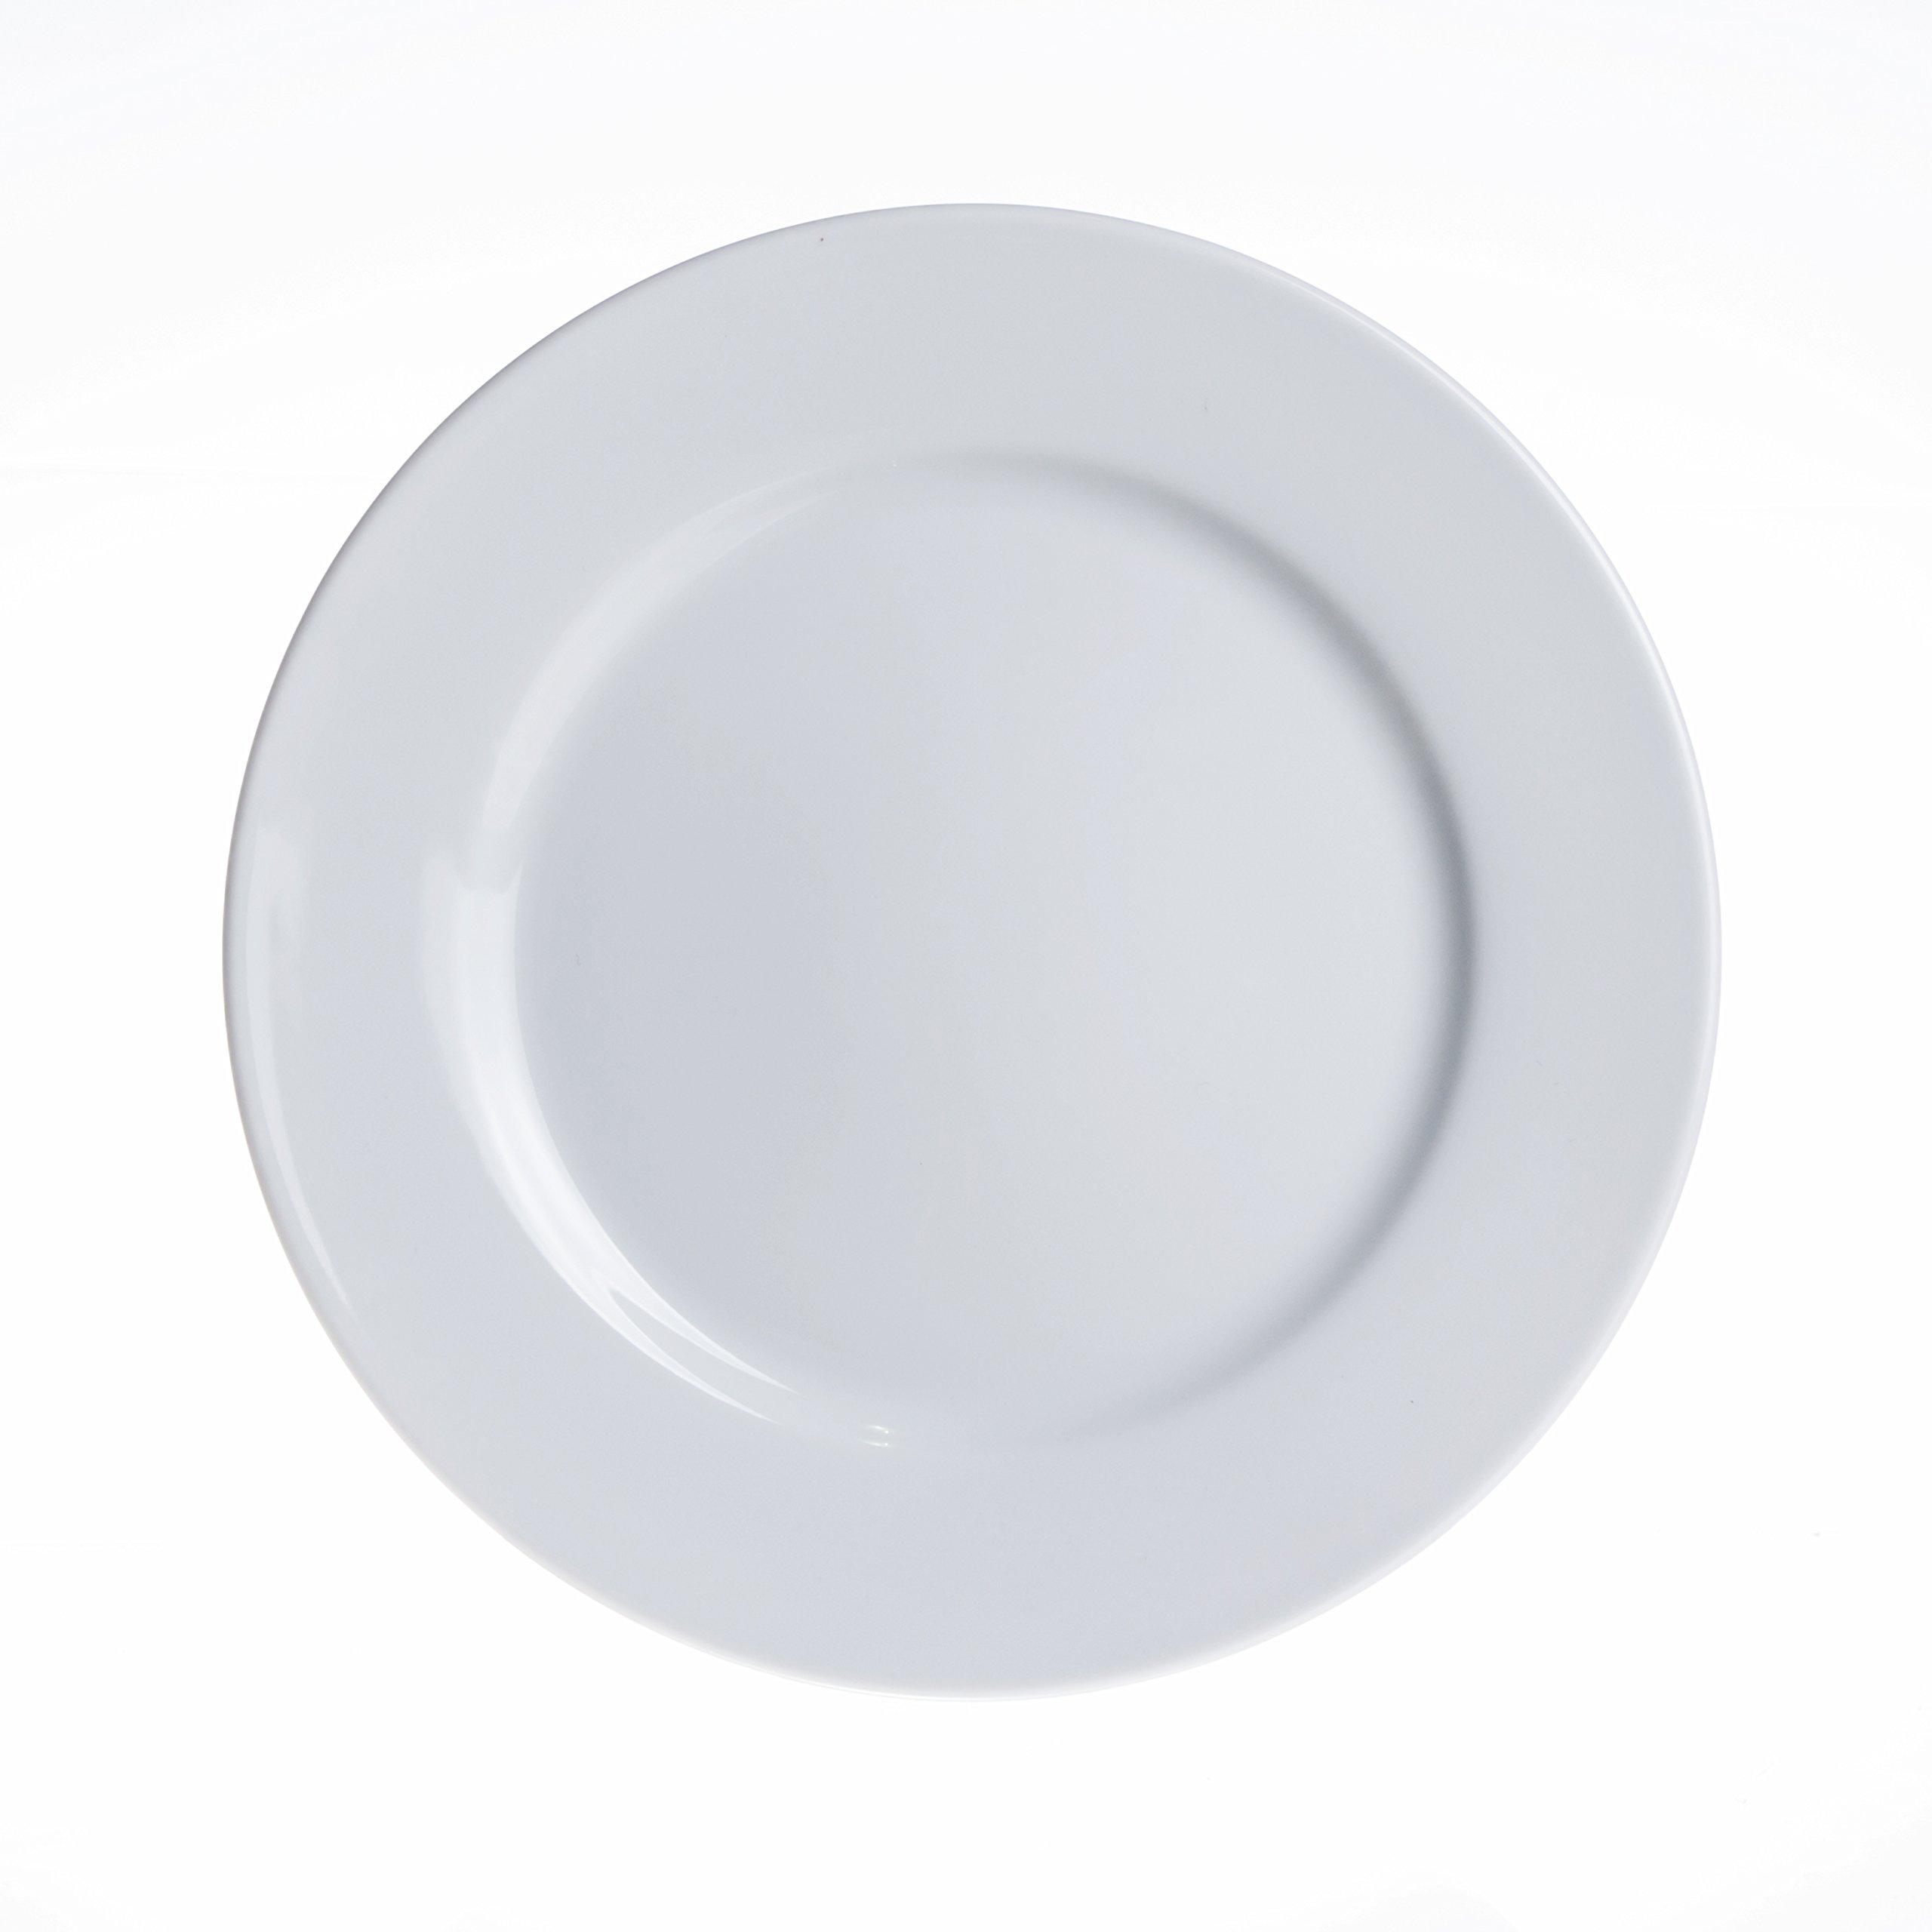 6-Piece Dinner/Soup/Dessert/Serving Plates Set, Durable White Porcelain, Restaurant&Hotel Quality (9'' Dinner Plates)